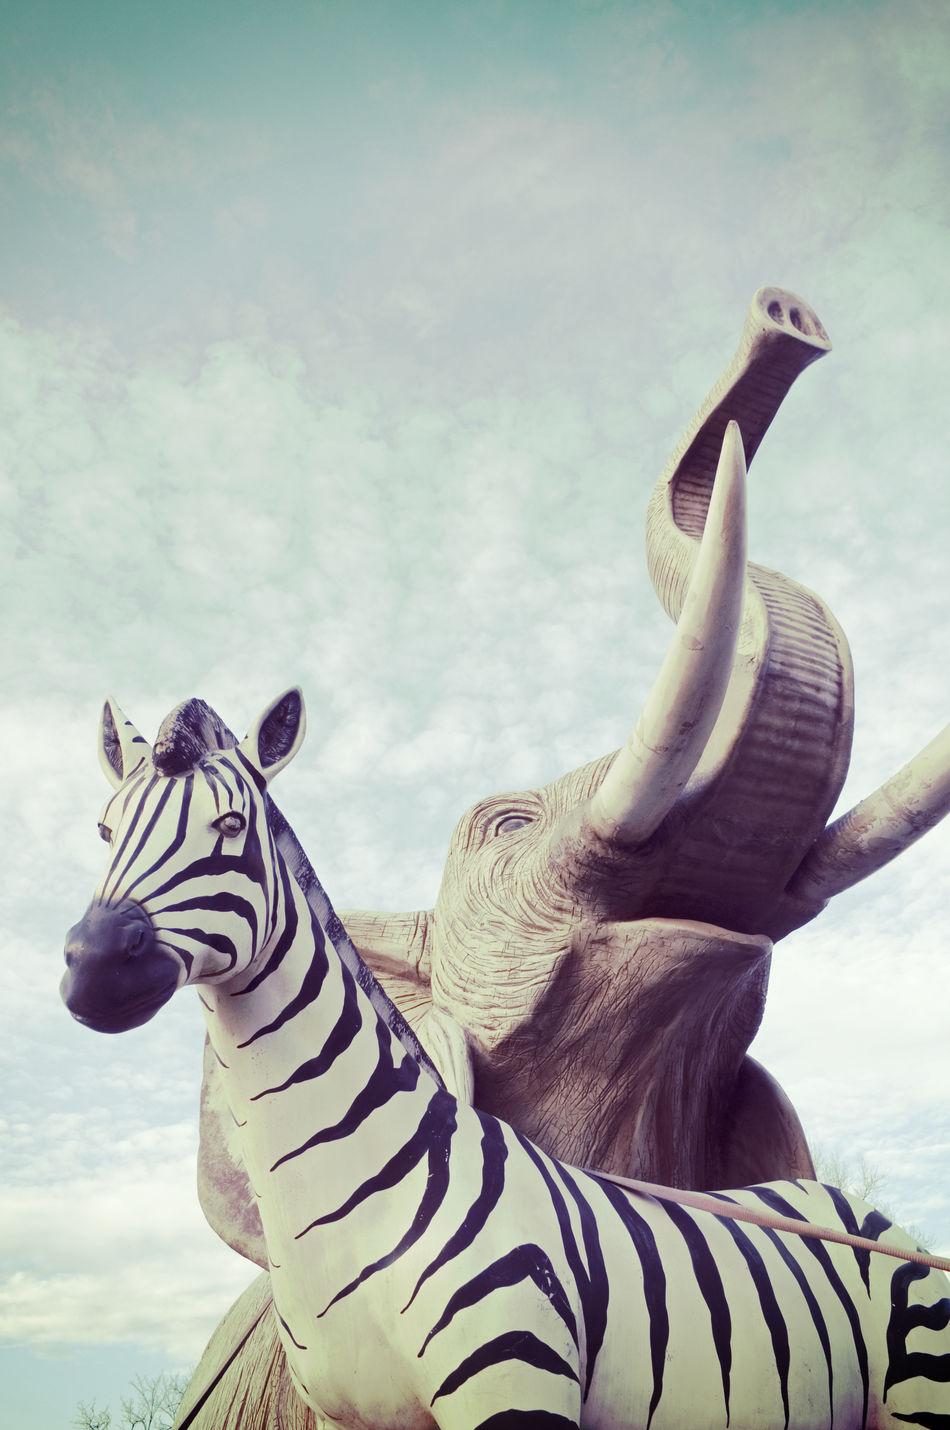 elephant and zebra fiberglass sculptures Africa African Animals Copy Elephant Fake Imitation Likeness No People Outdoors Replica  Reproduction Sculpture Sky Symbols Together Unreal Vertical Zebra